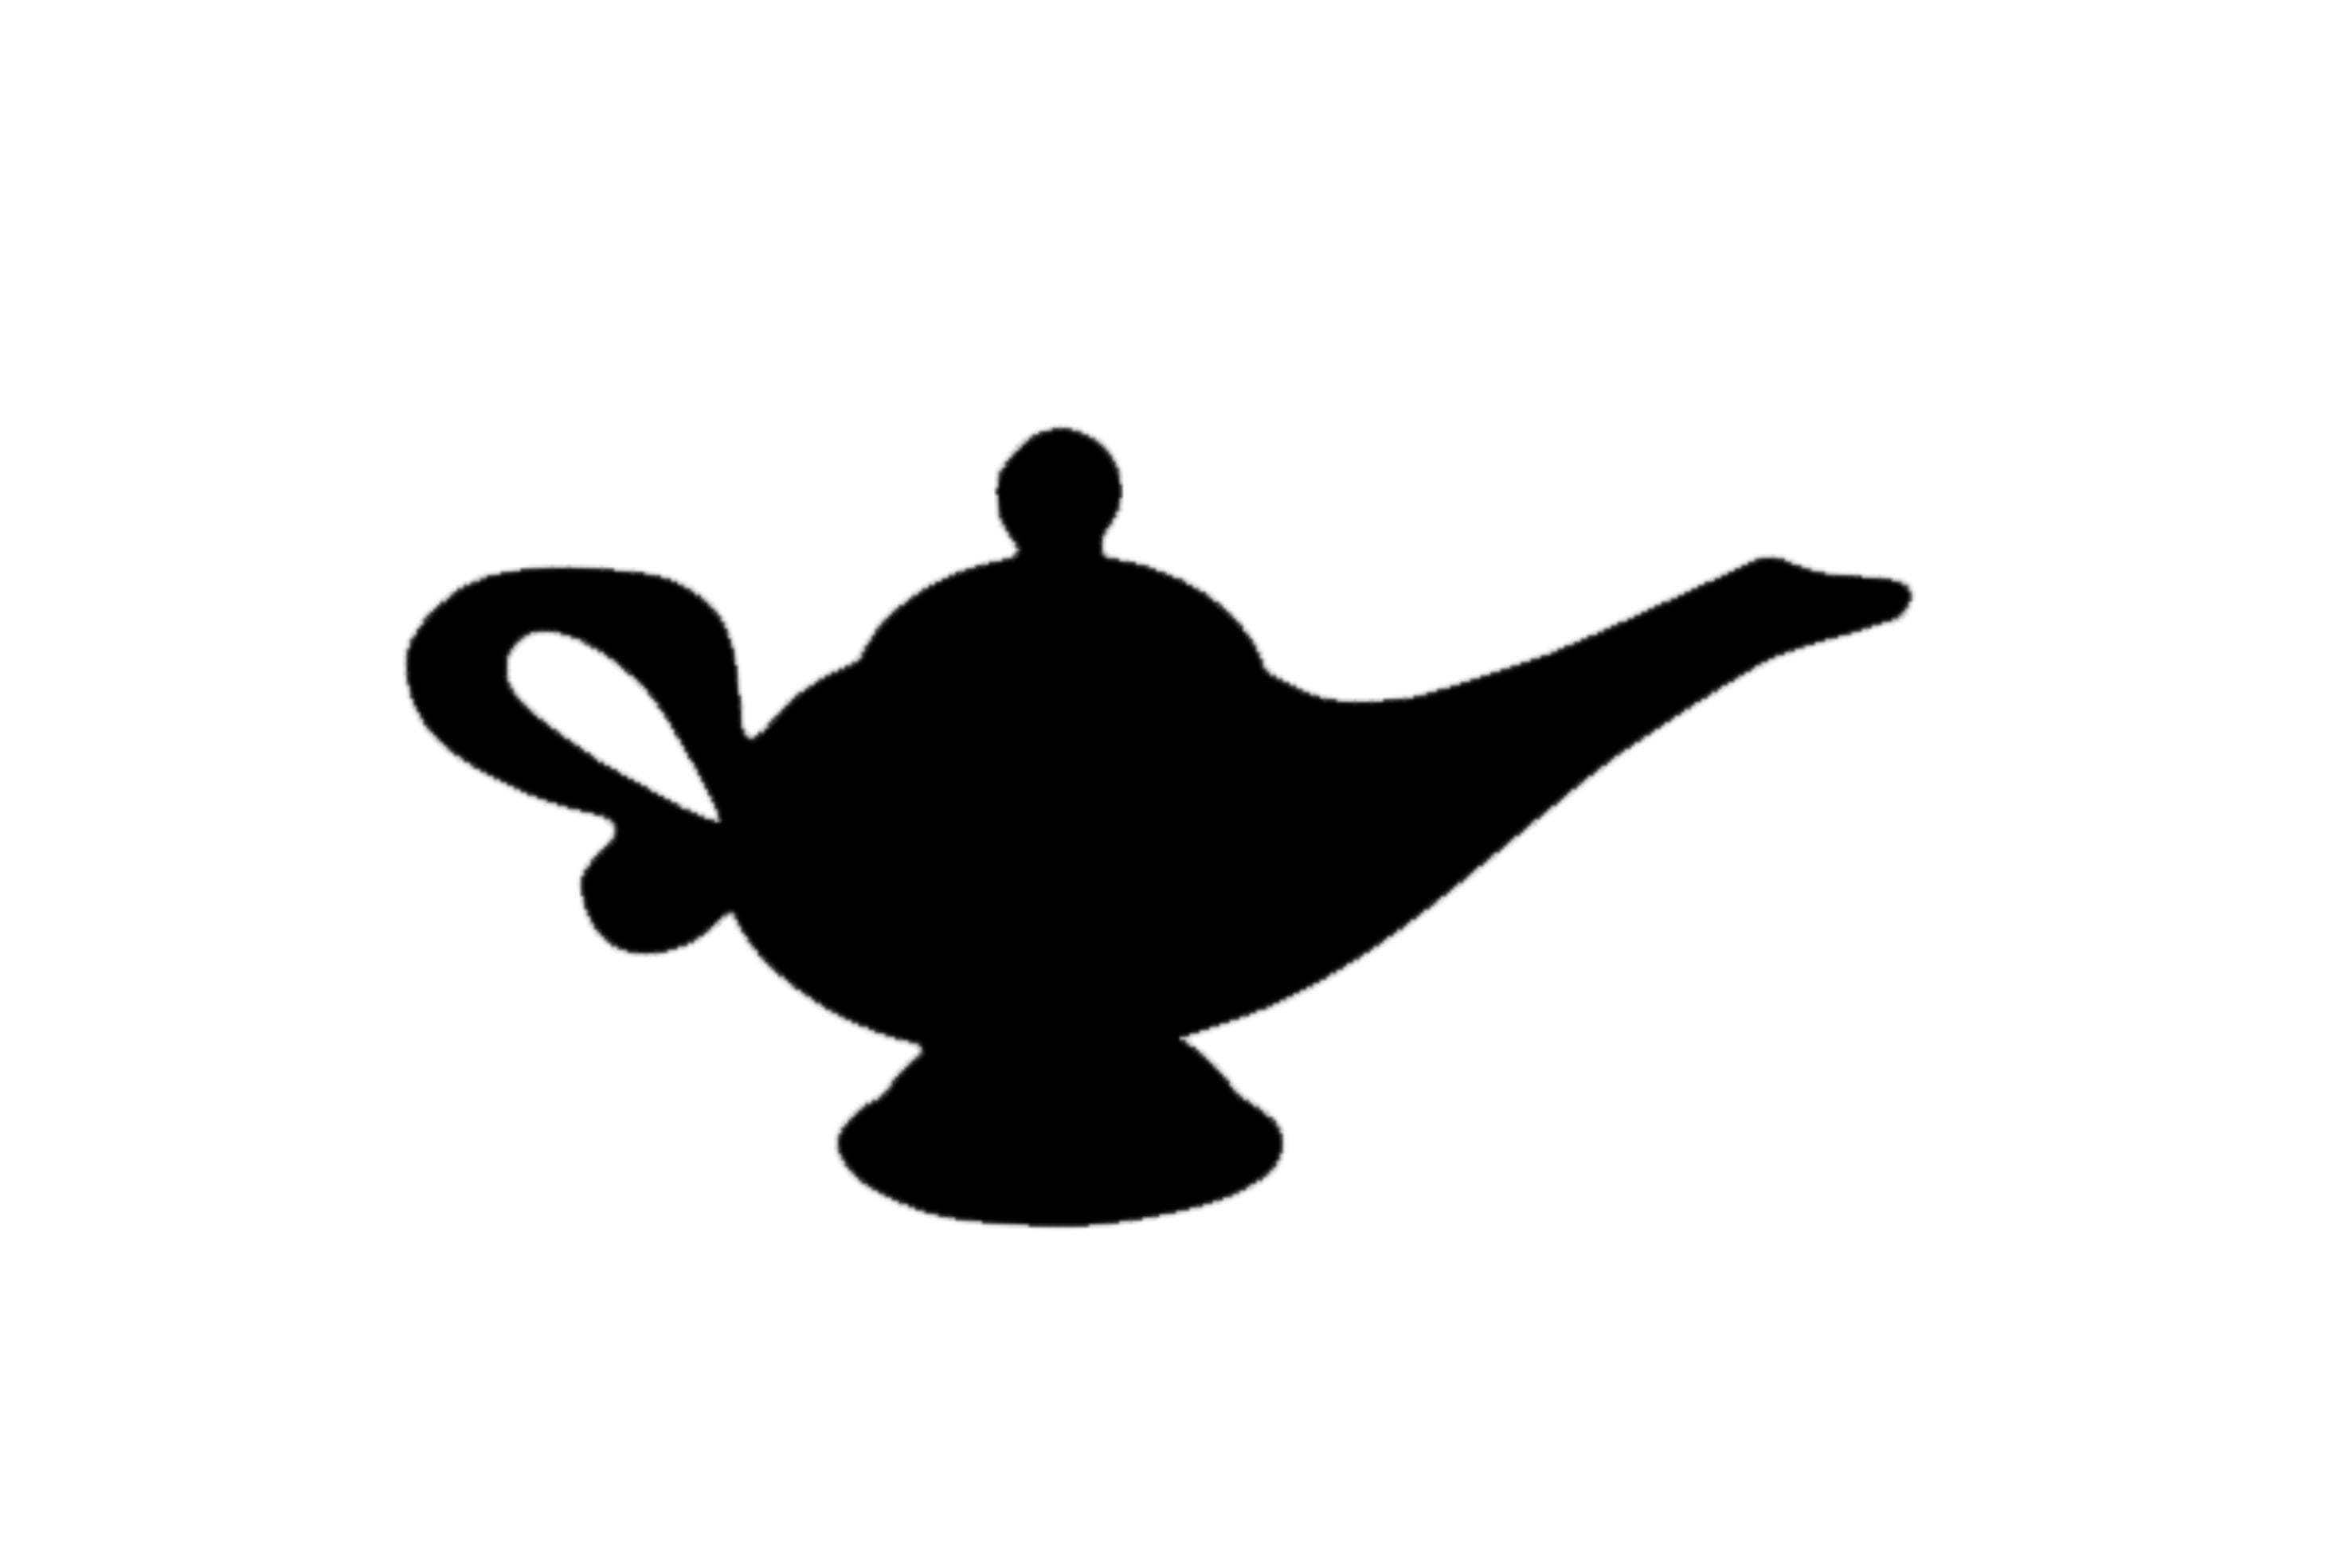 Genie S Lamp From Disney S Aladdin Disney Magic Band